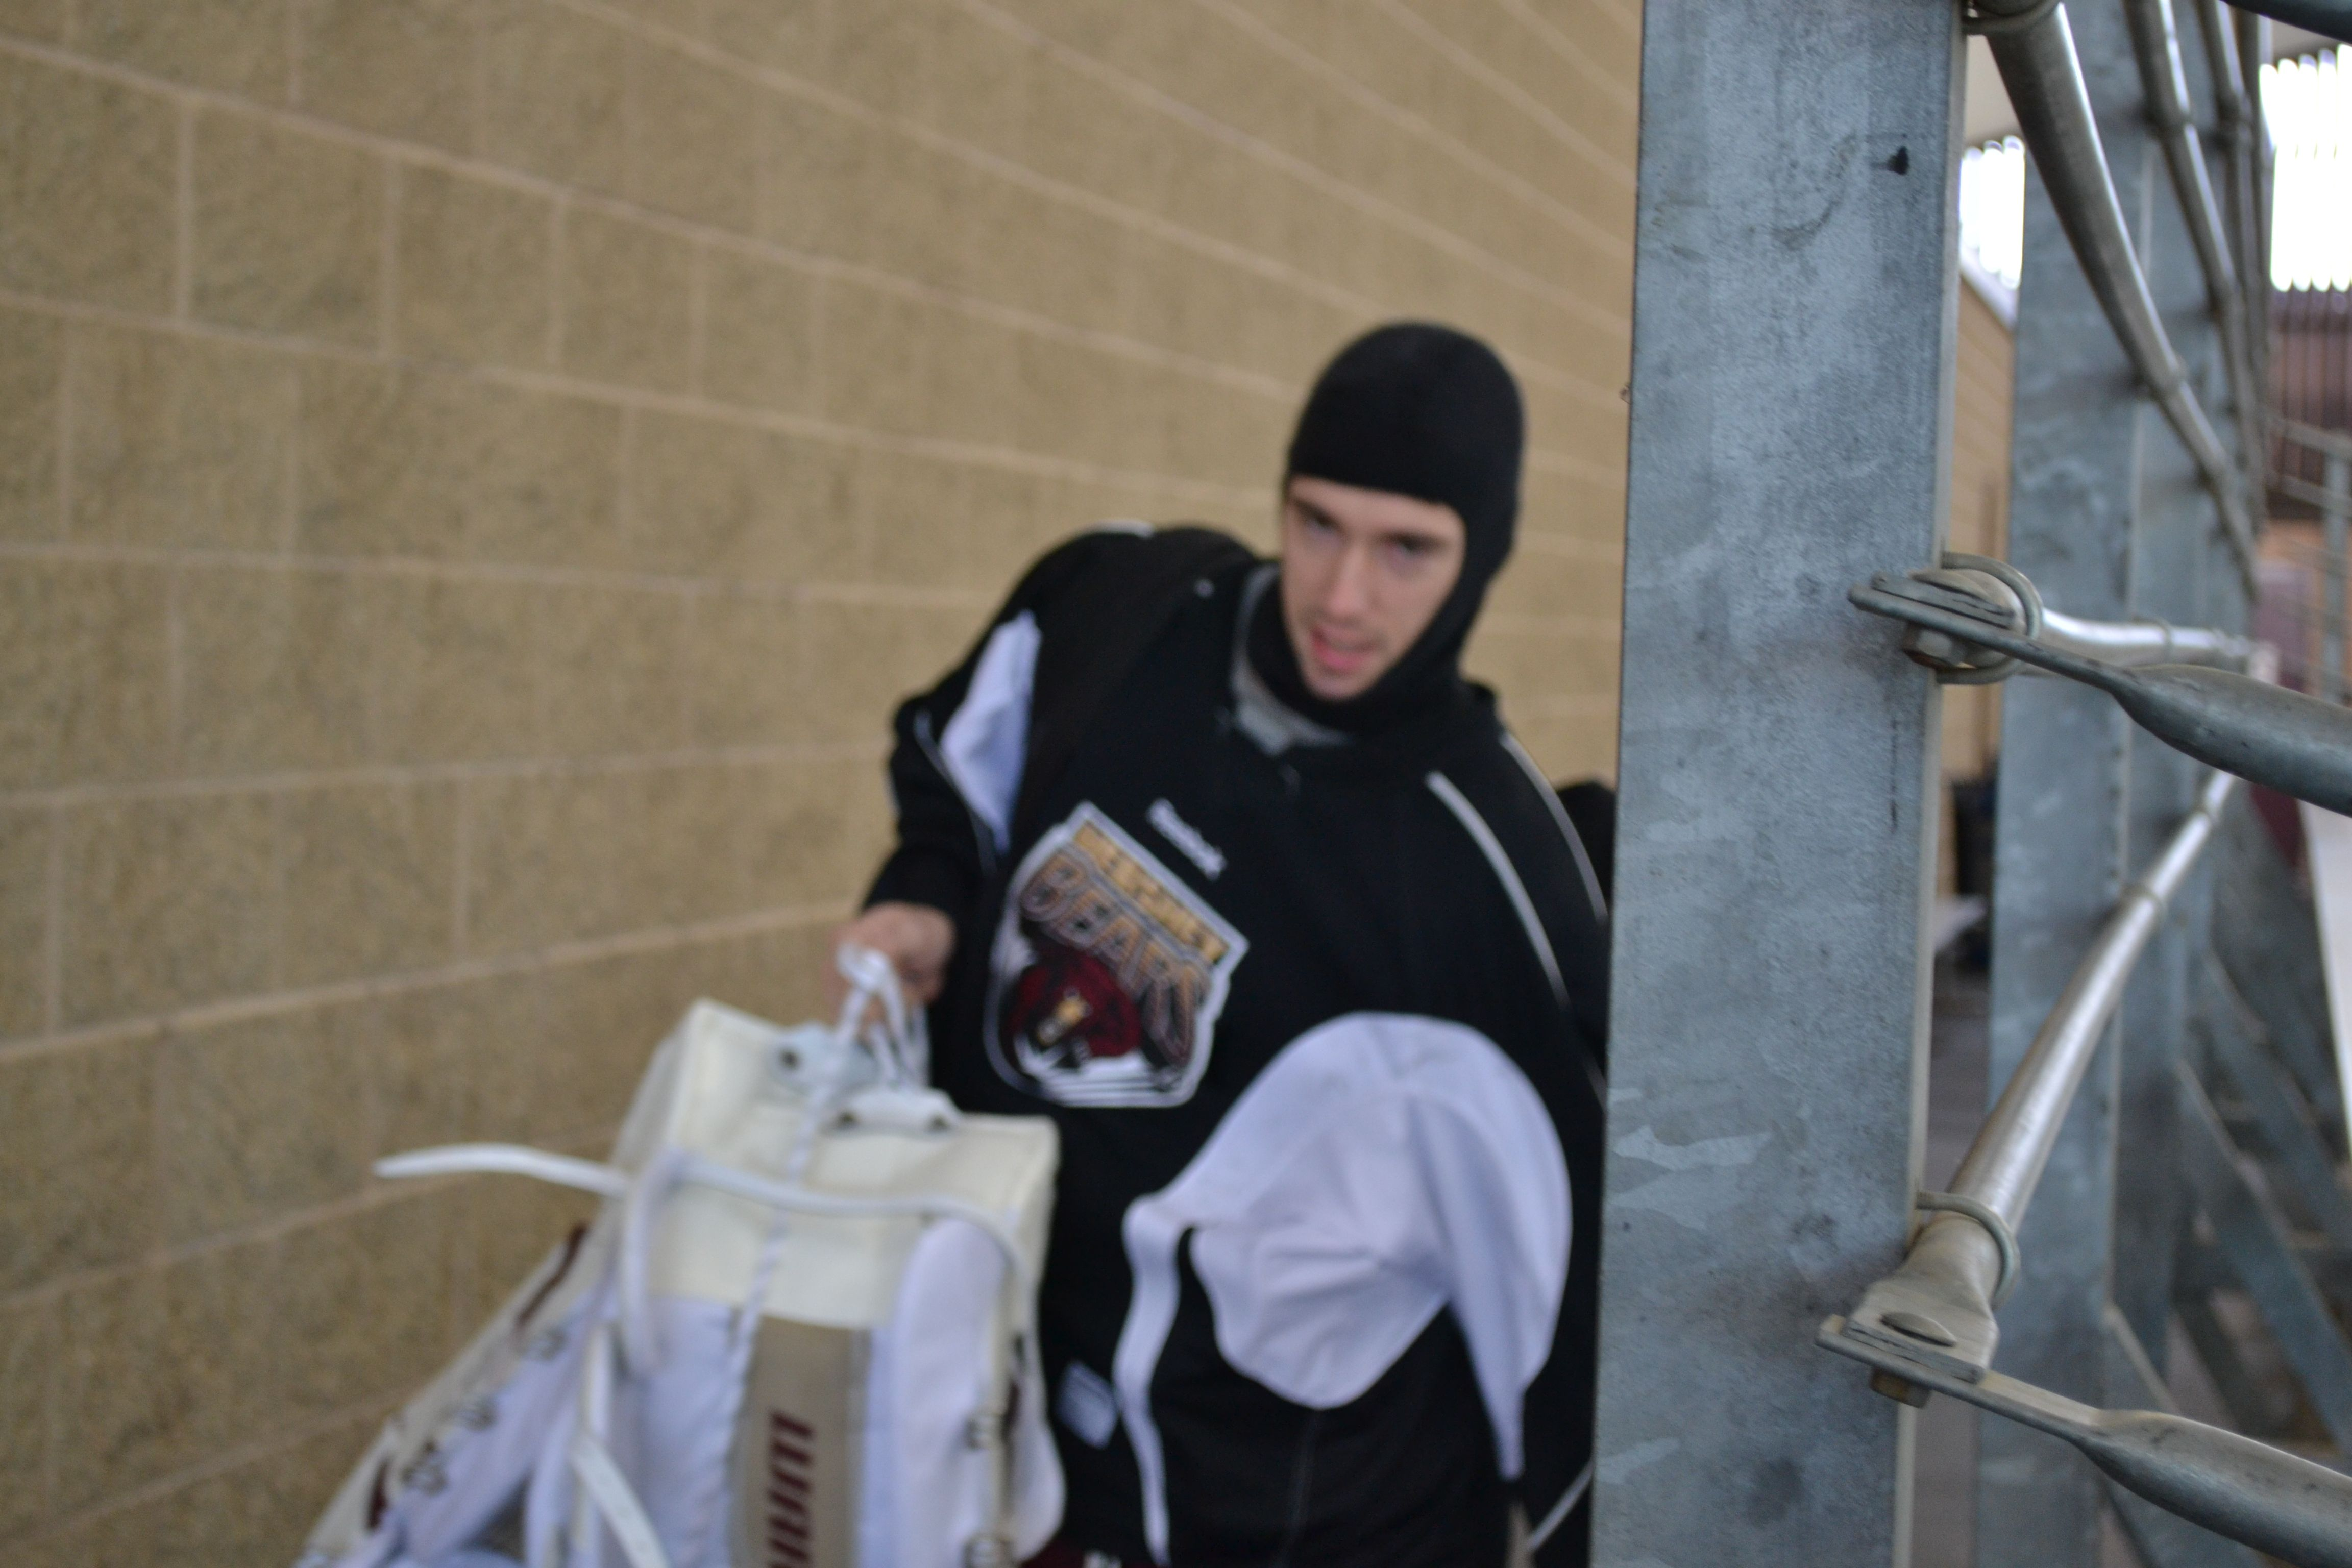 Hershey Bears goalie Dany Sabourin dressed for openair